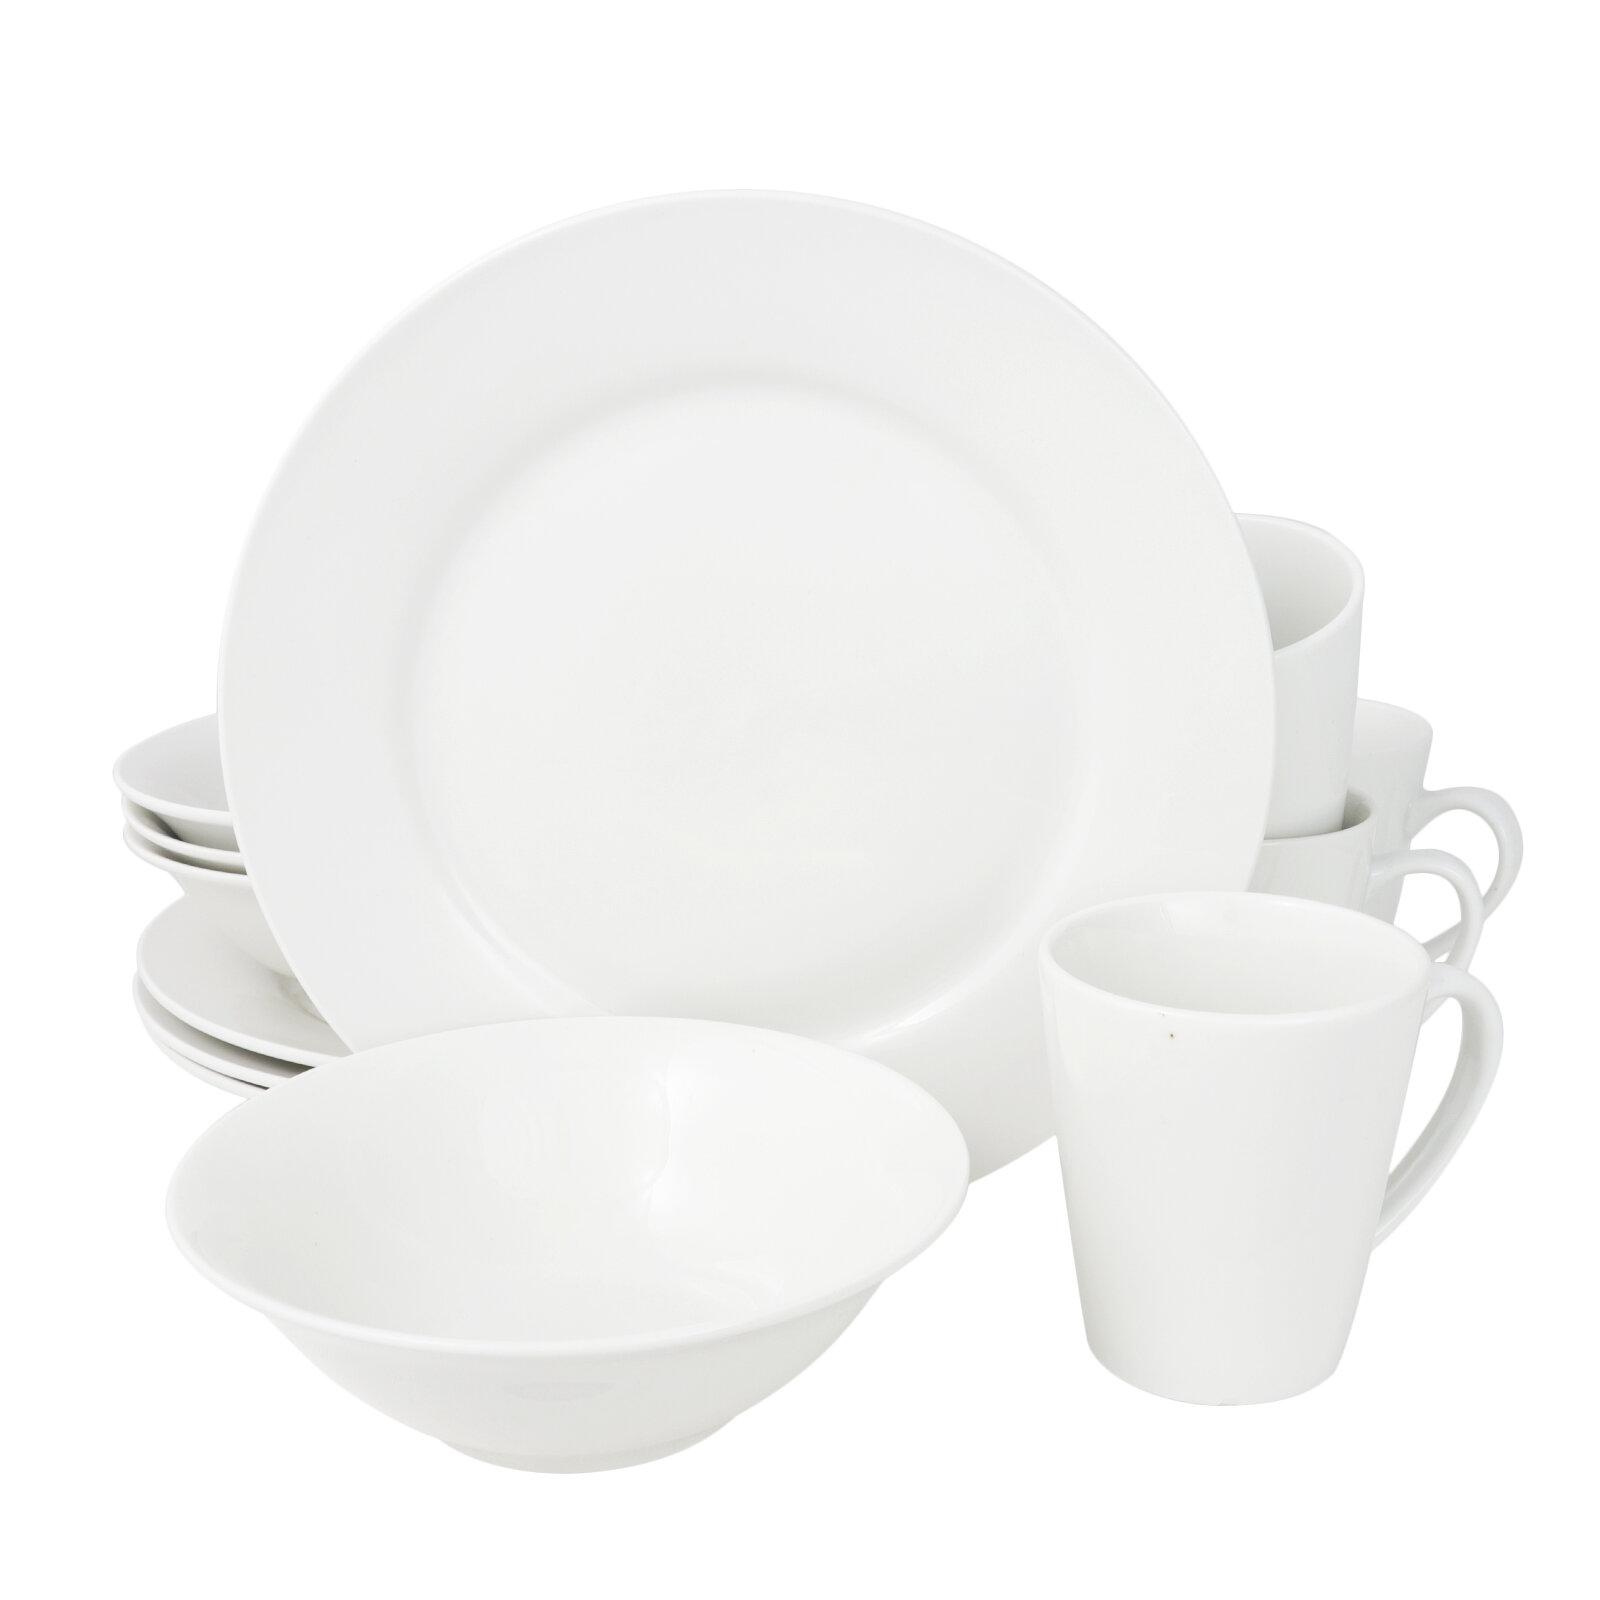 Porcelain Alcott Hill Dinnerware Sets You Ll Love In 2021 Wayfair